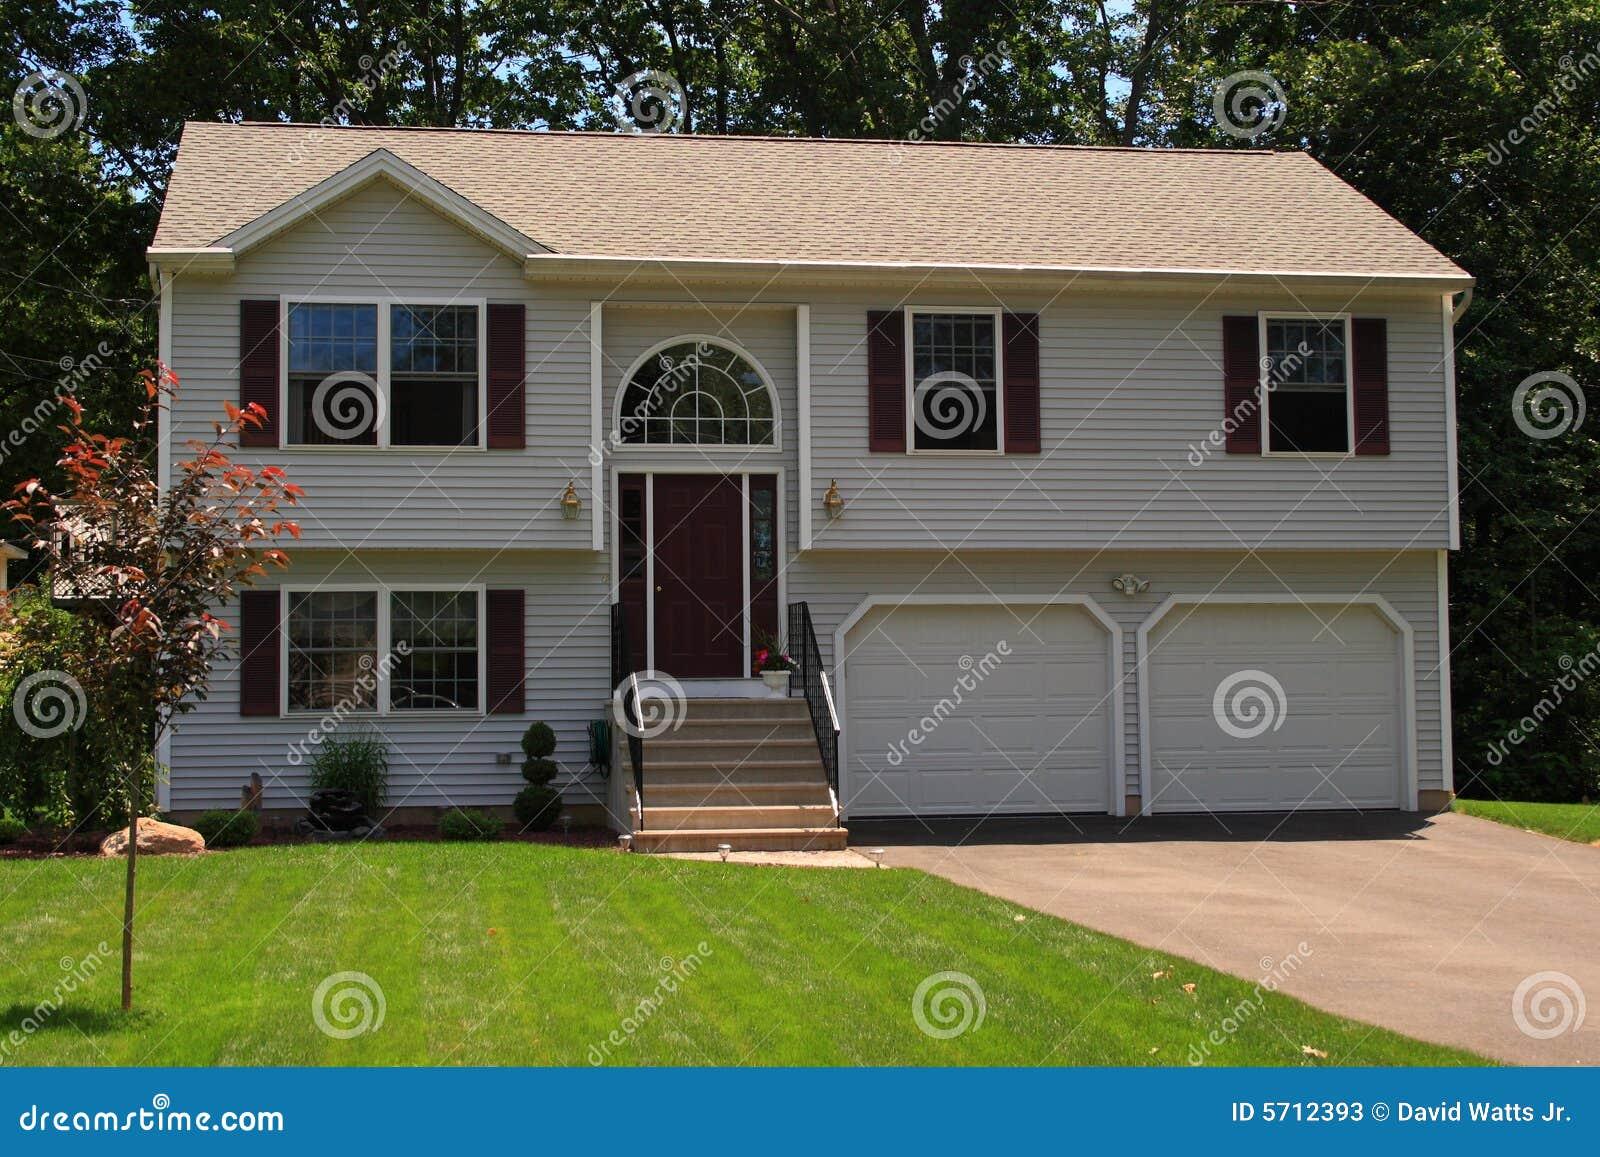 two story single family house stock photos image 5712393